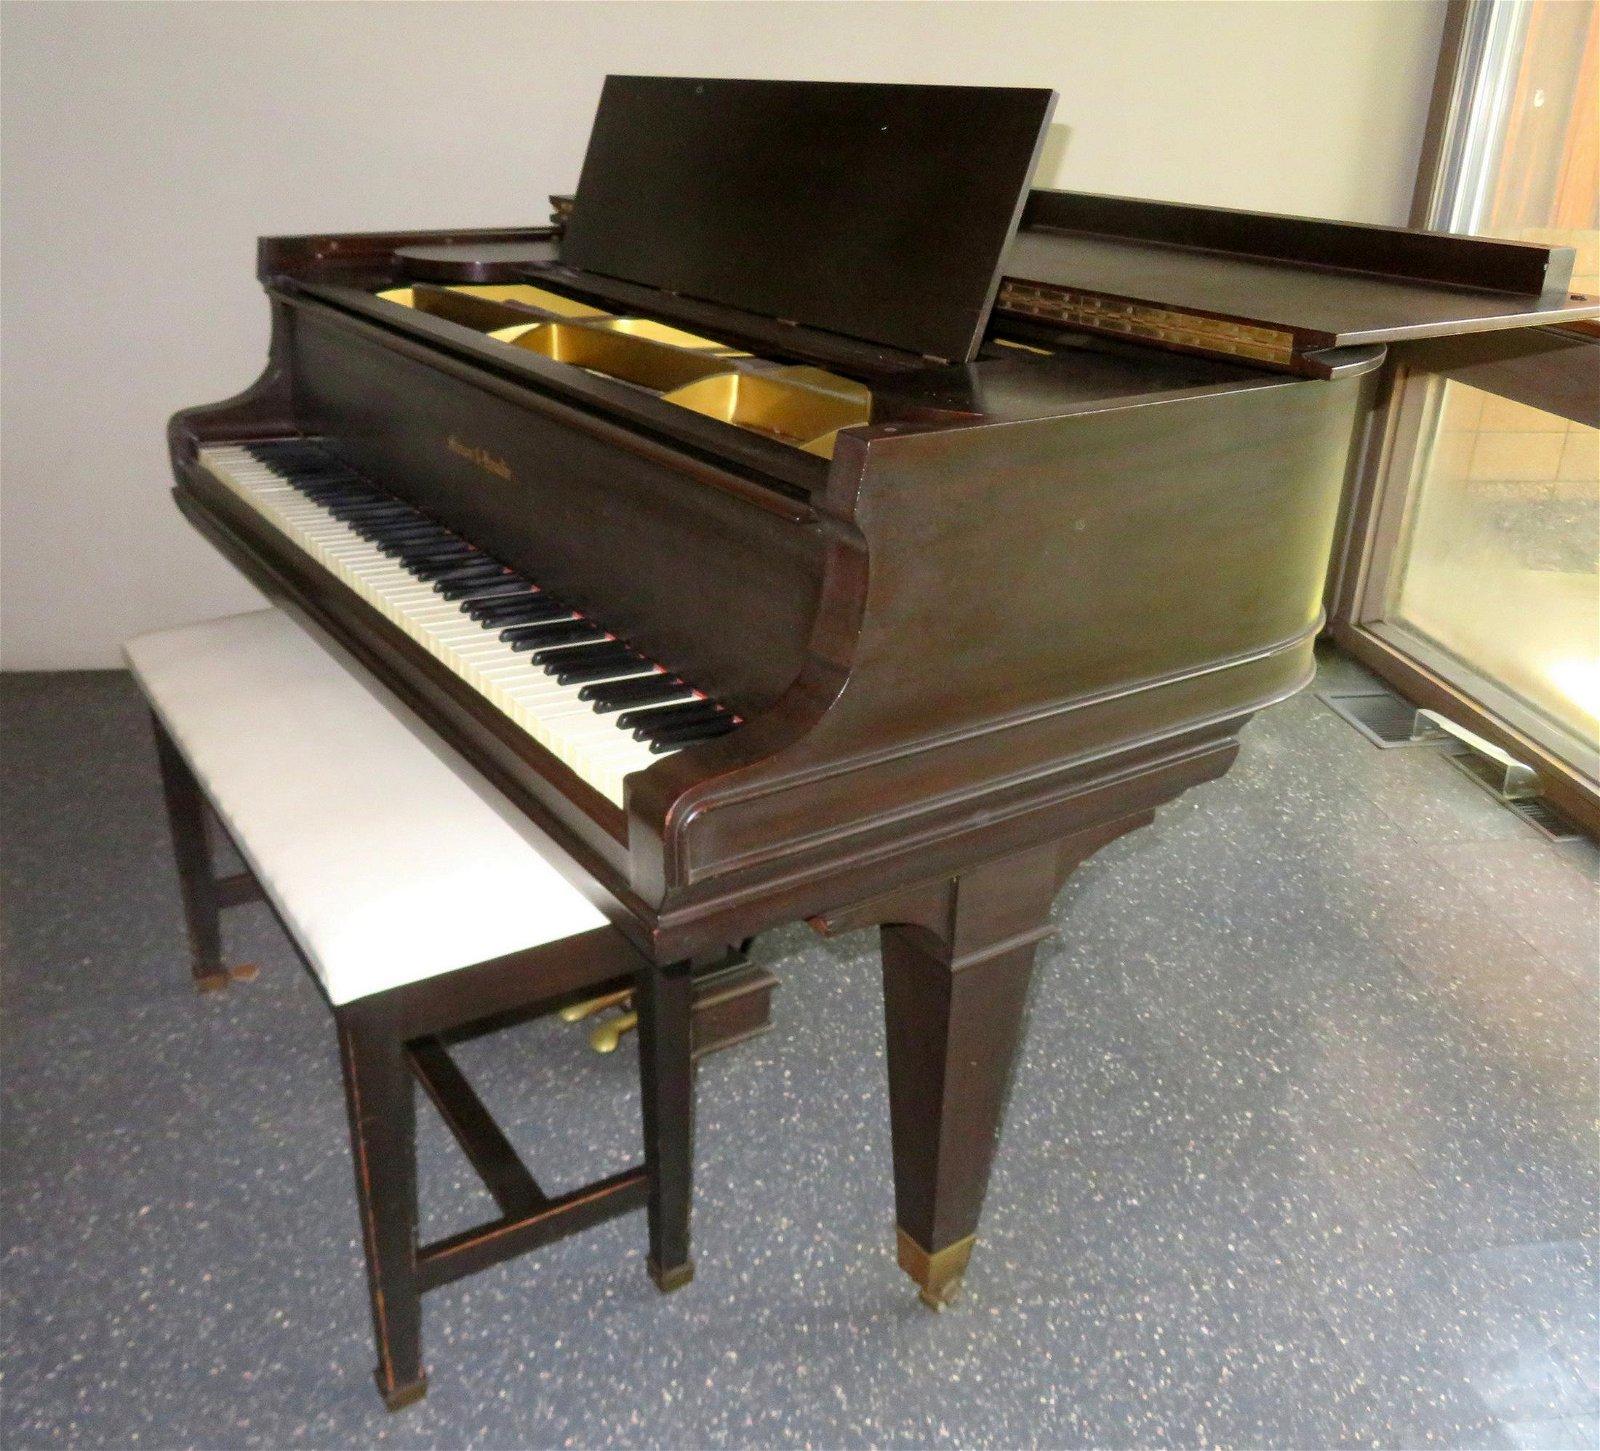 MASON & HAMLIN Grand piano Model Ax6, Tension Resonator